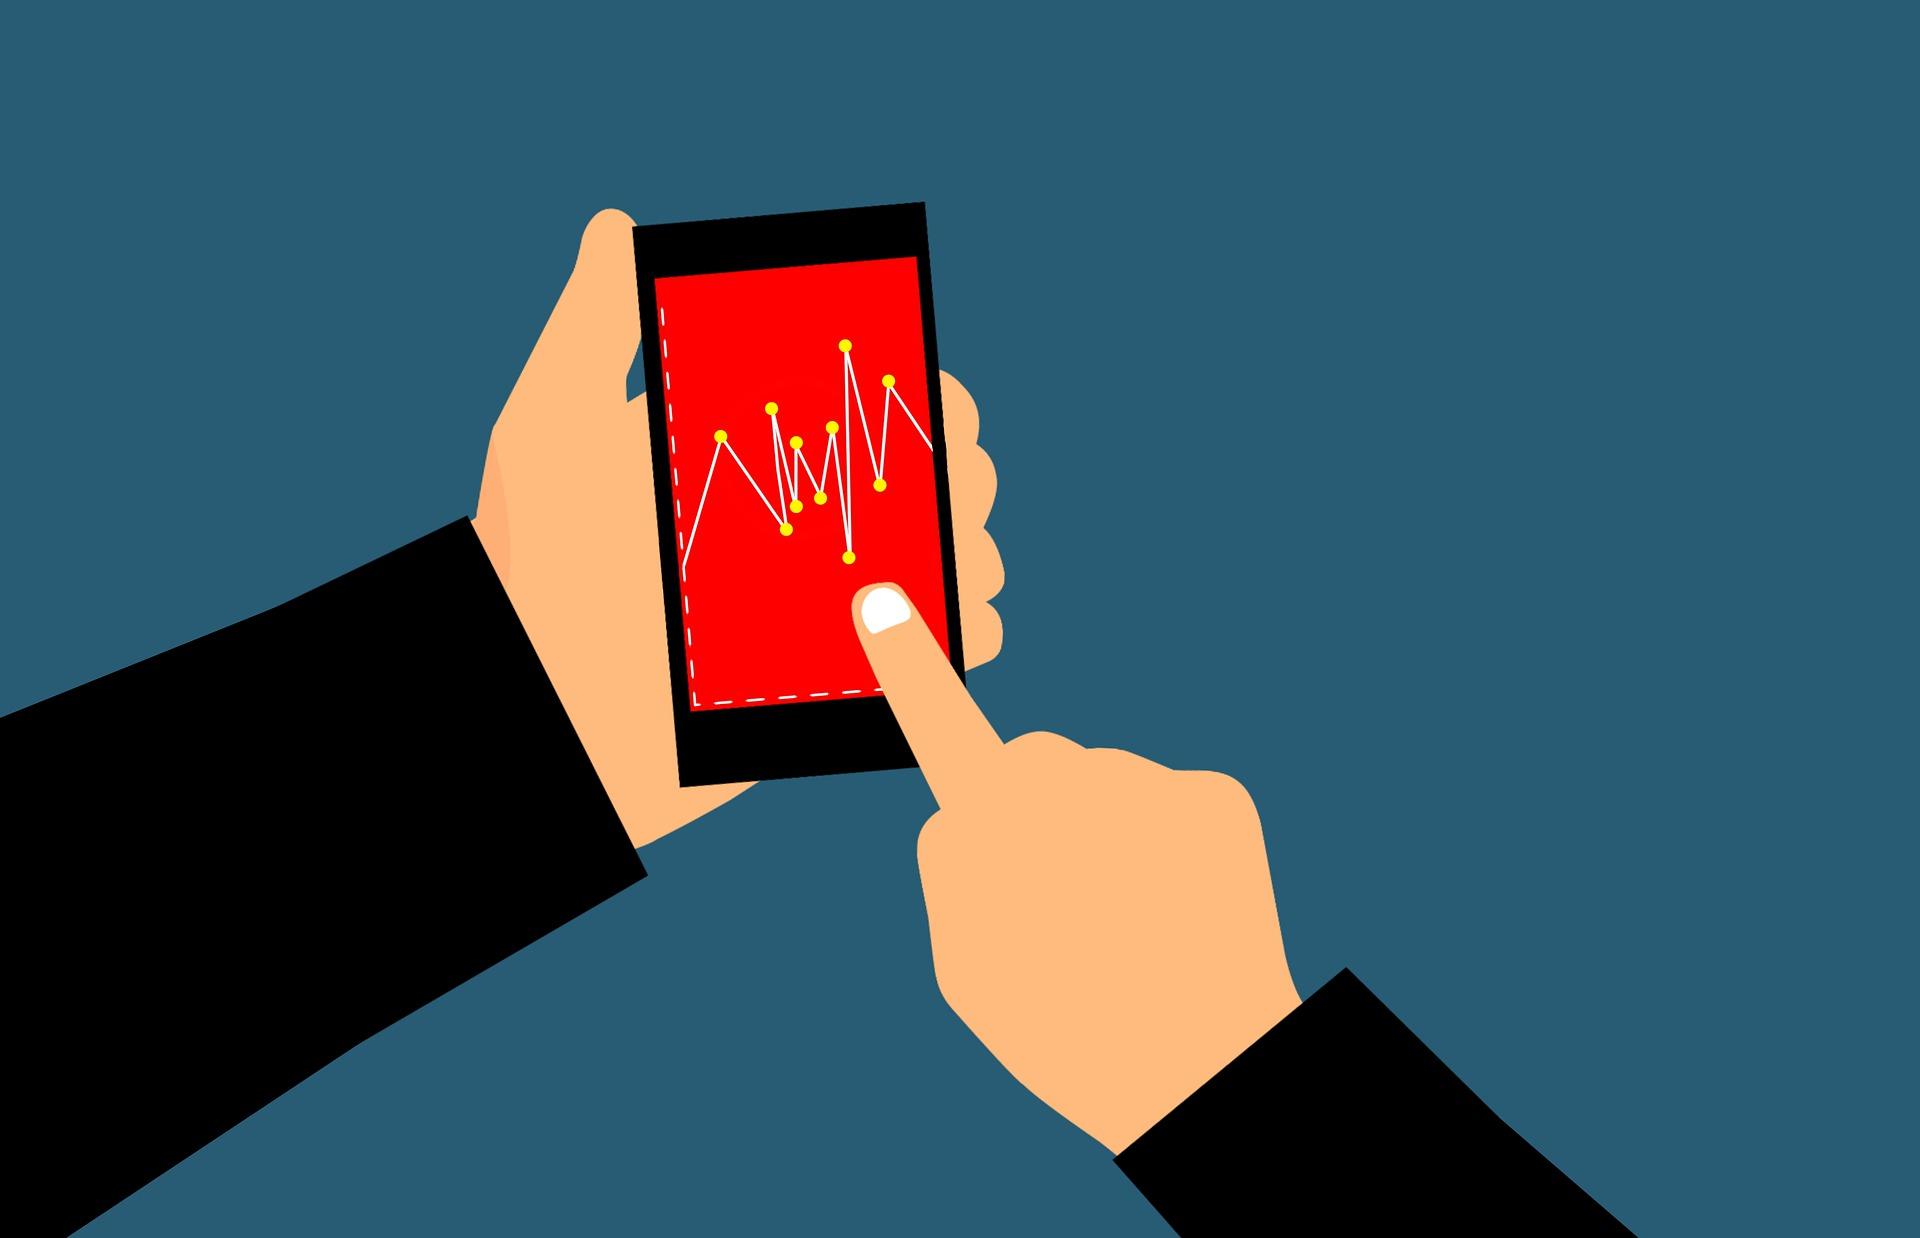 app usage statistics